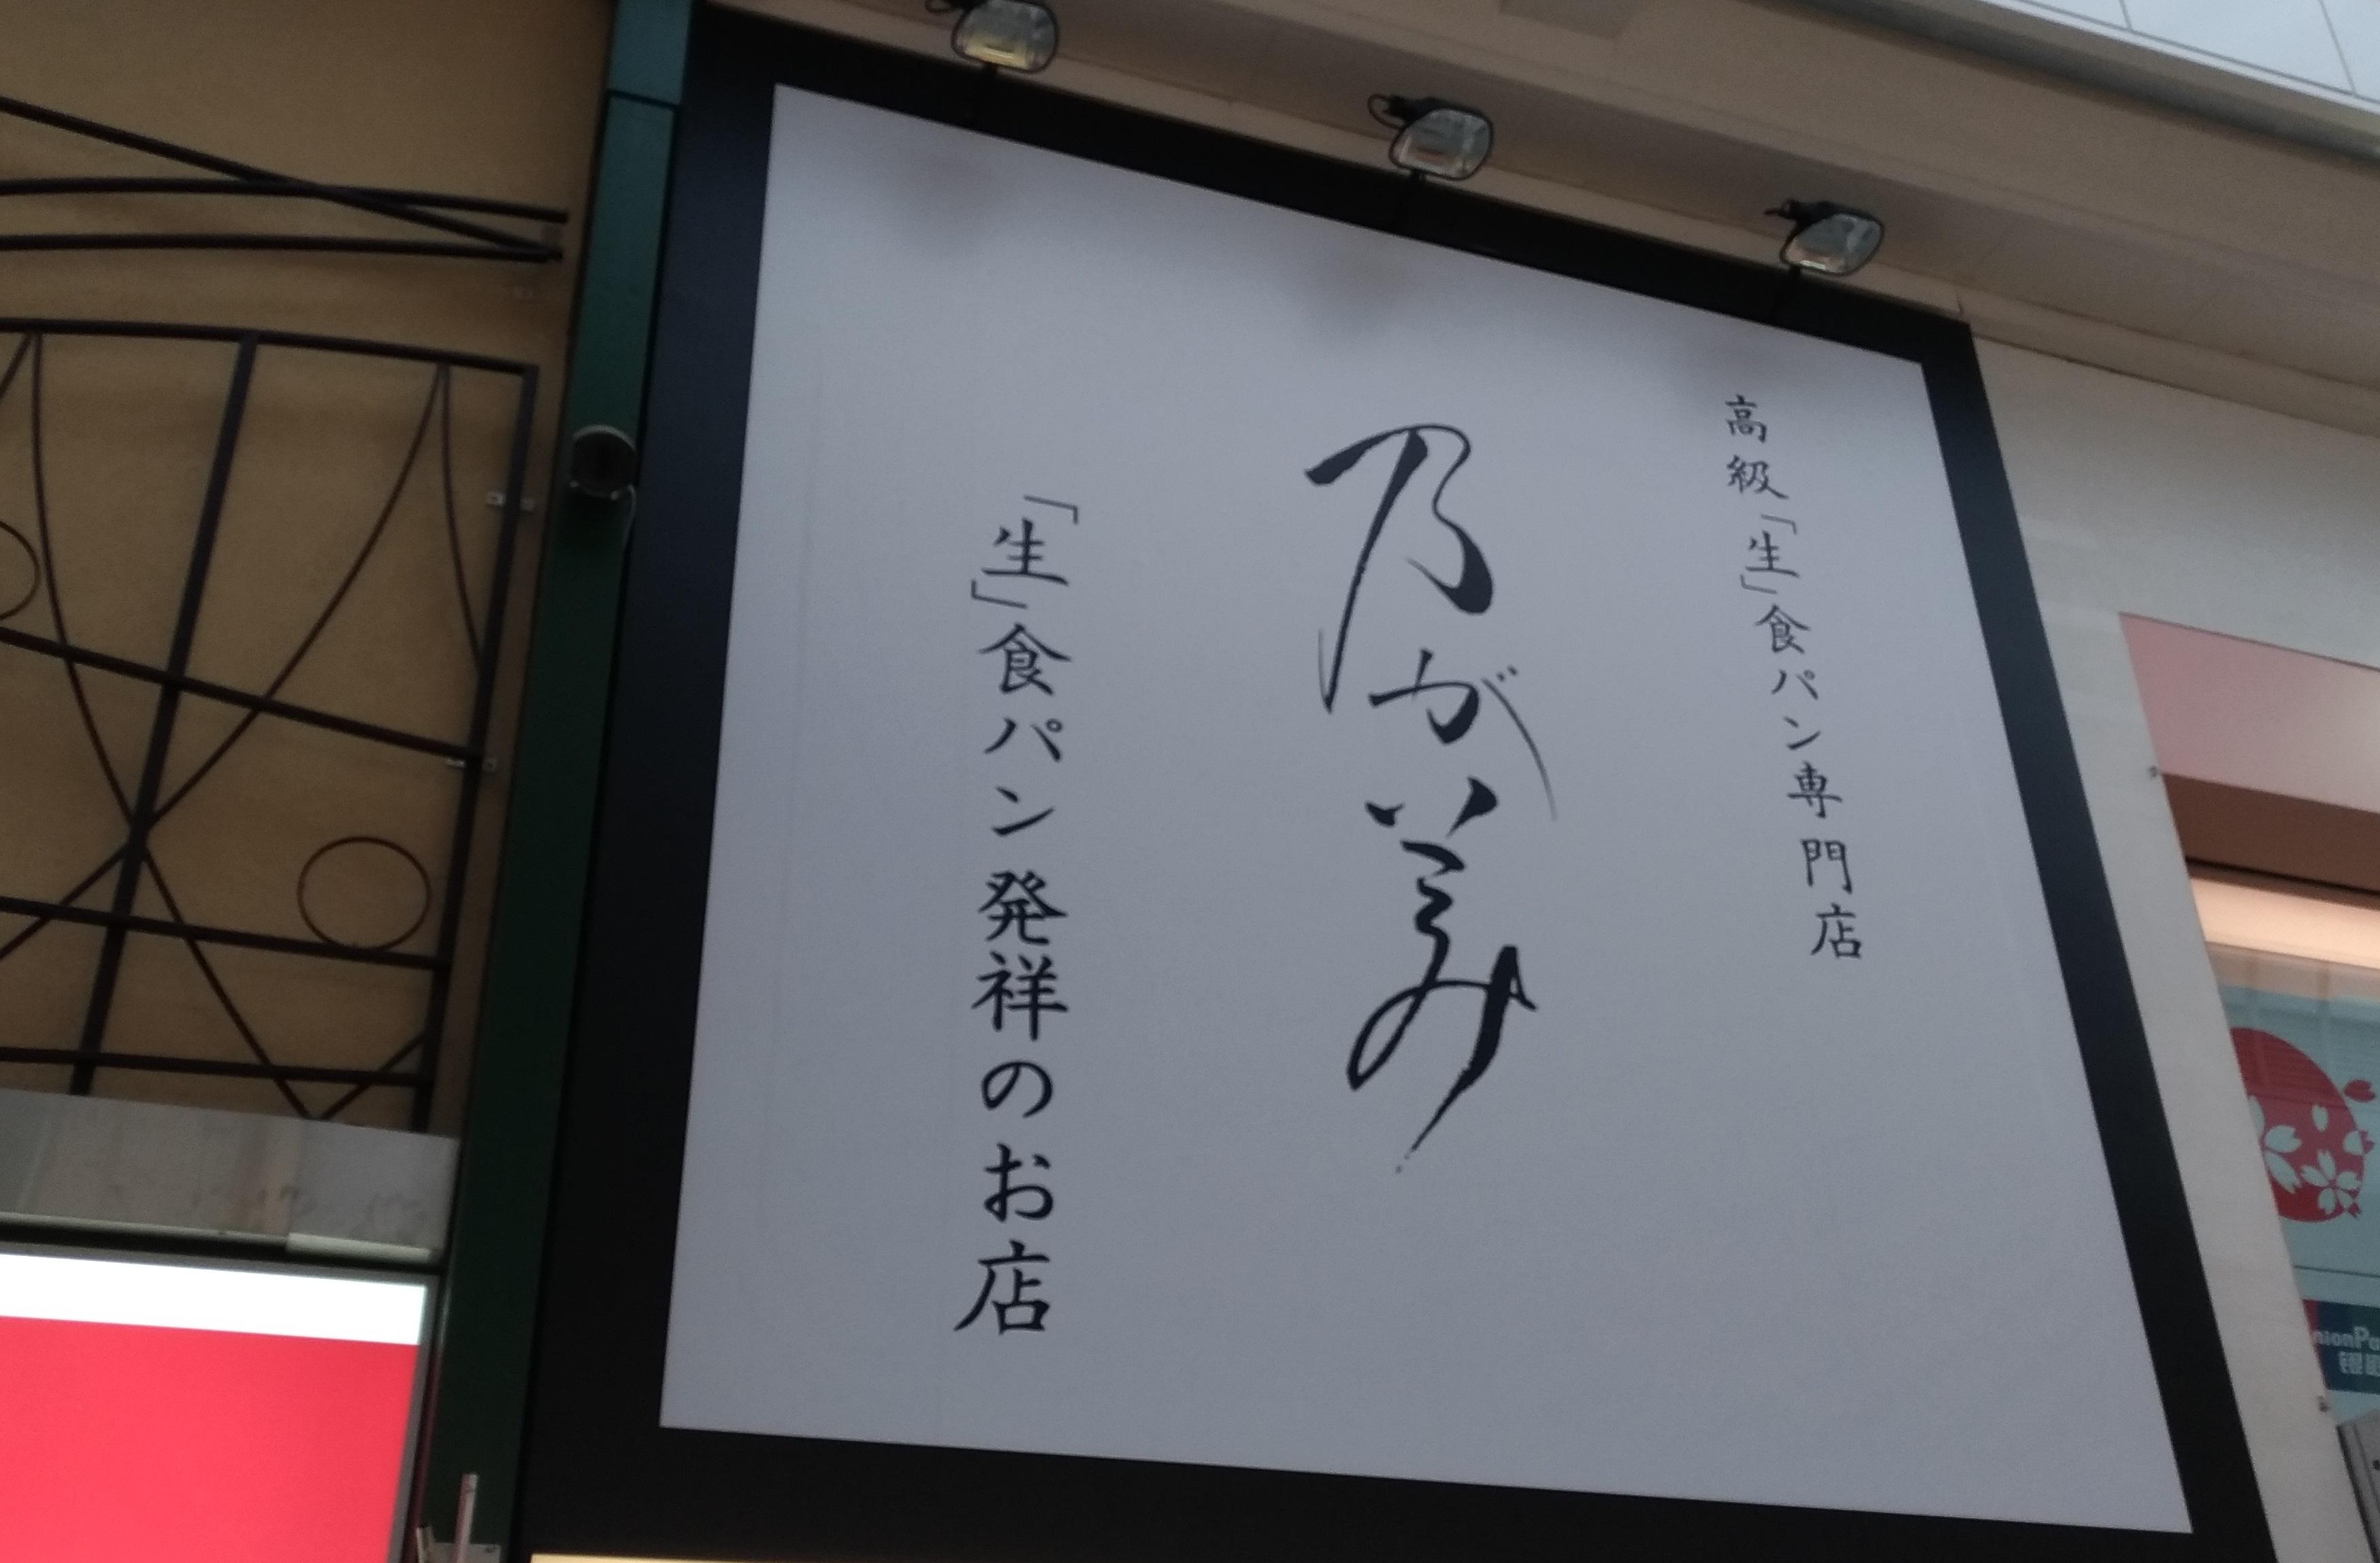 osaka_namba_shokupan1.jpg